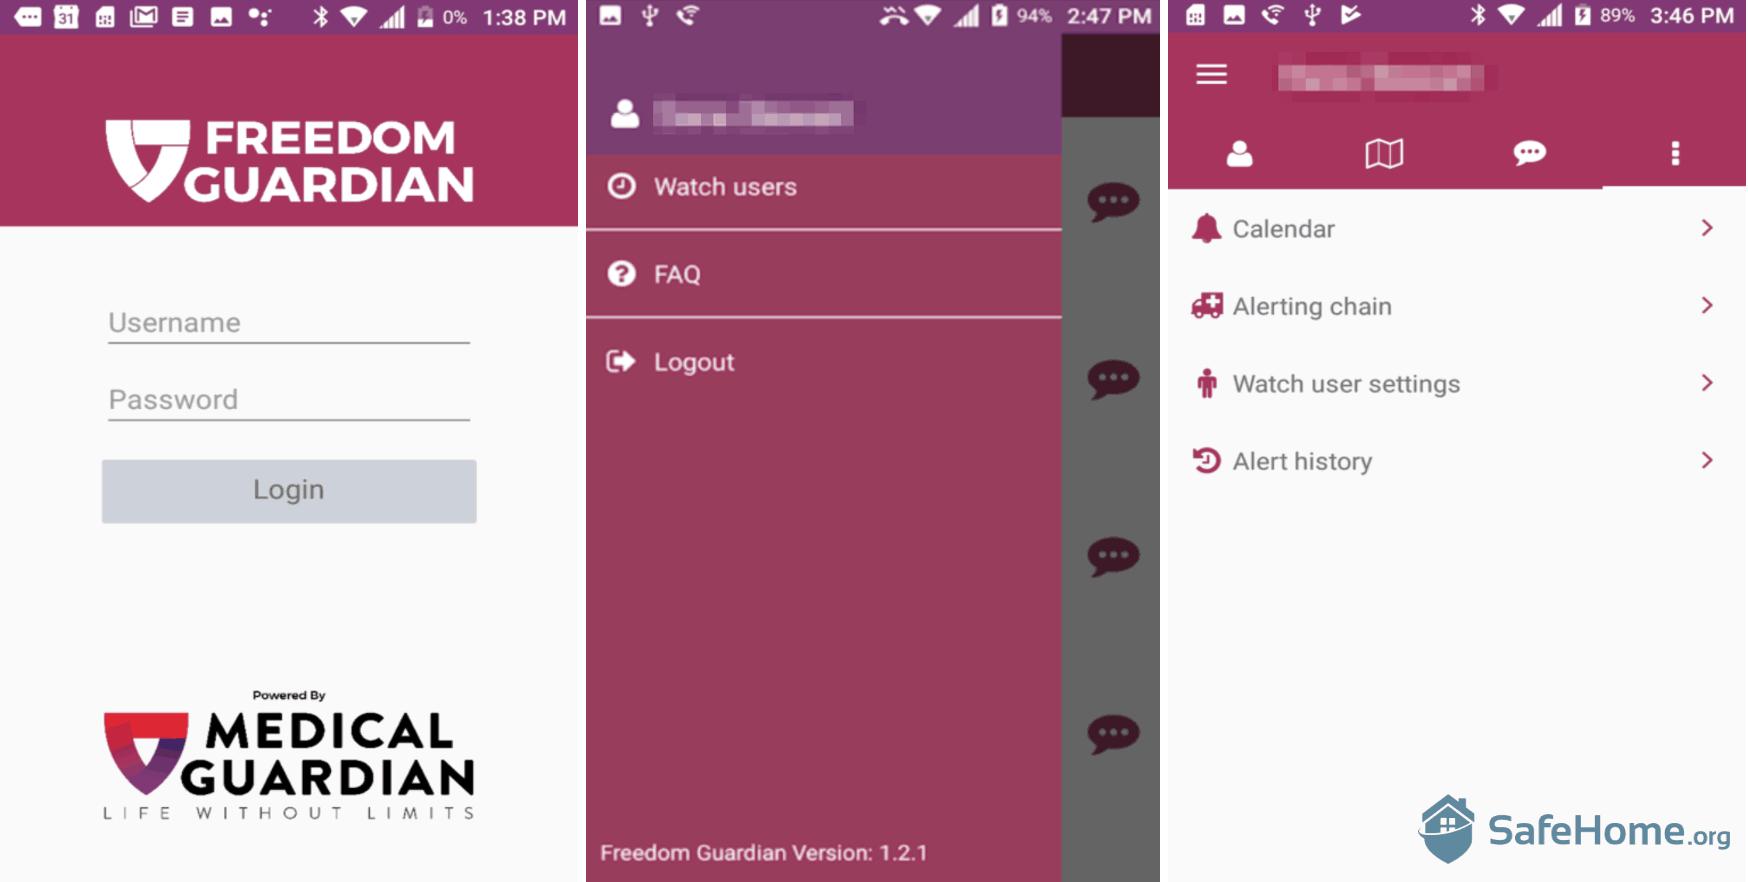 Freedom Guardian App